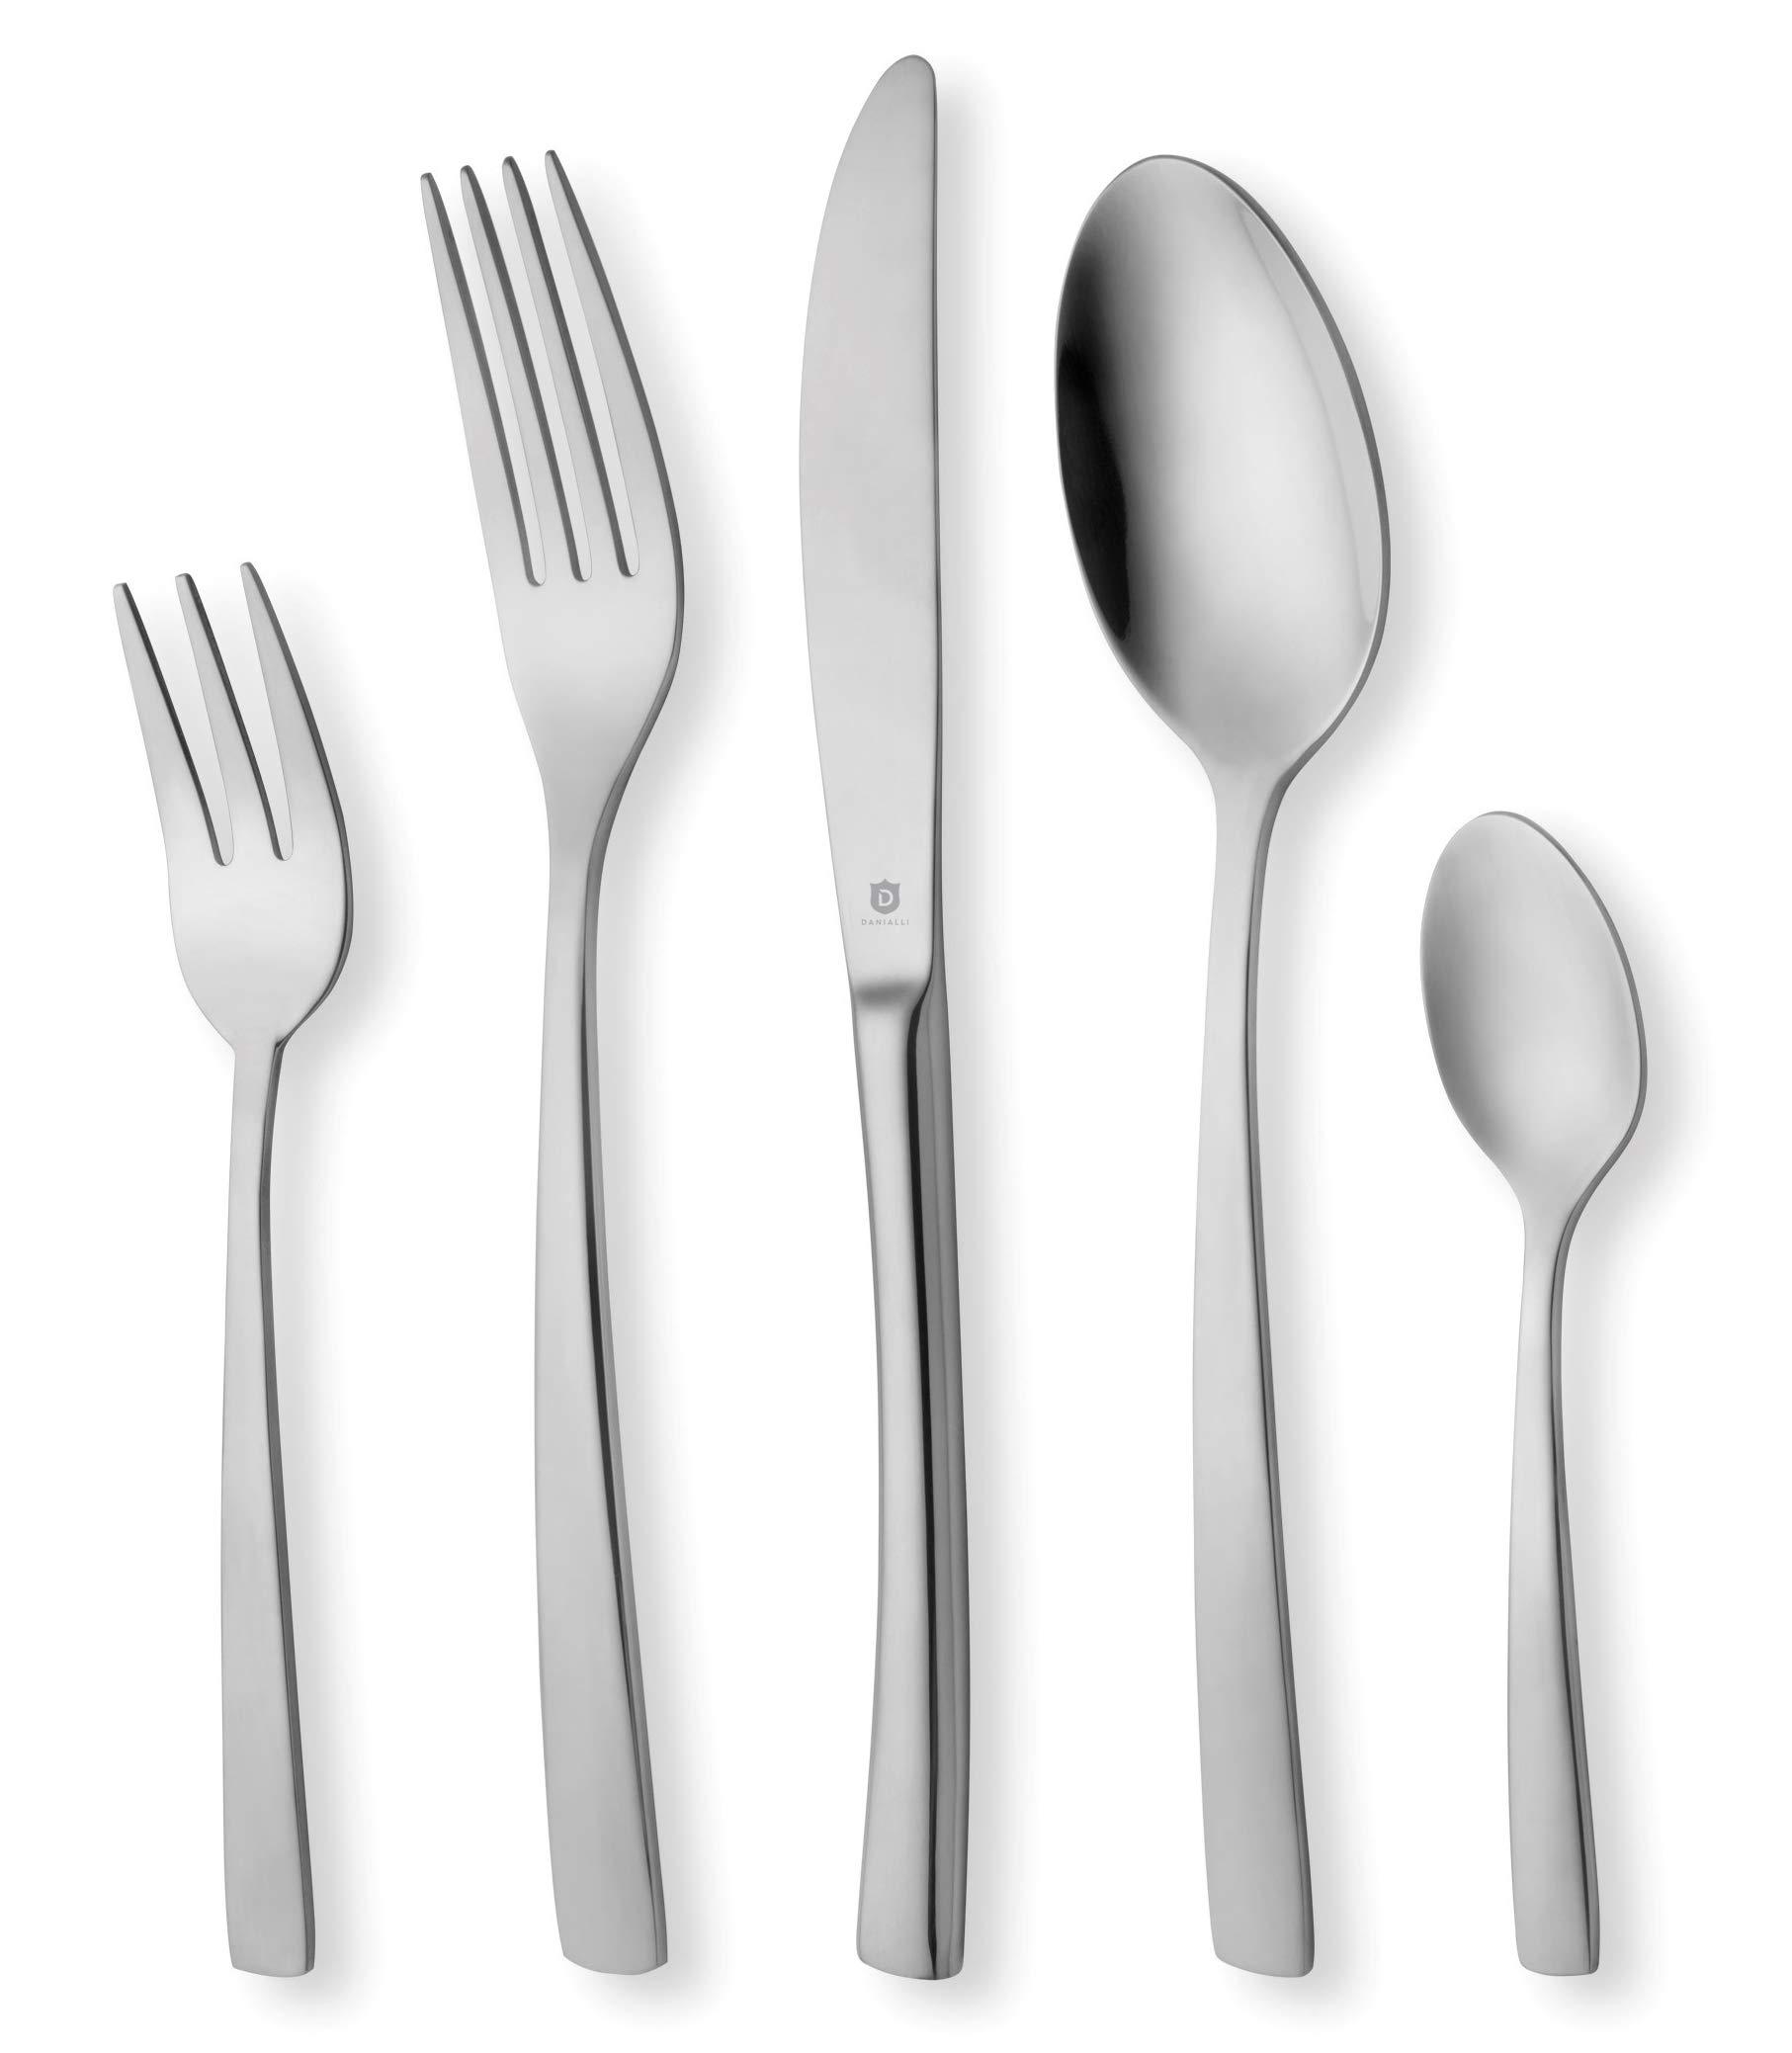 DANIALLI 30-Piece Flatware Set For 6, Modern Sleek Design Silverware Set, 18 10 Stainless Steel Utensils, Include Knife/Fork/Spoon, Mirror Polished Set of Cutlery, Dishwasher Safe